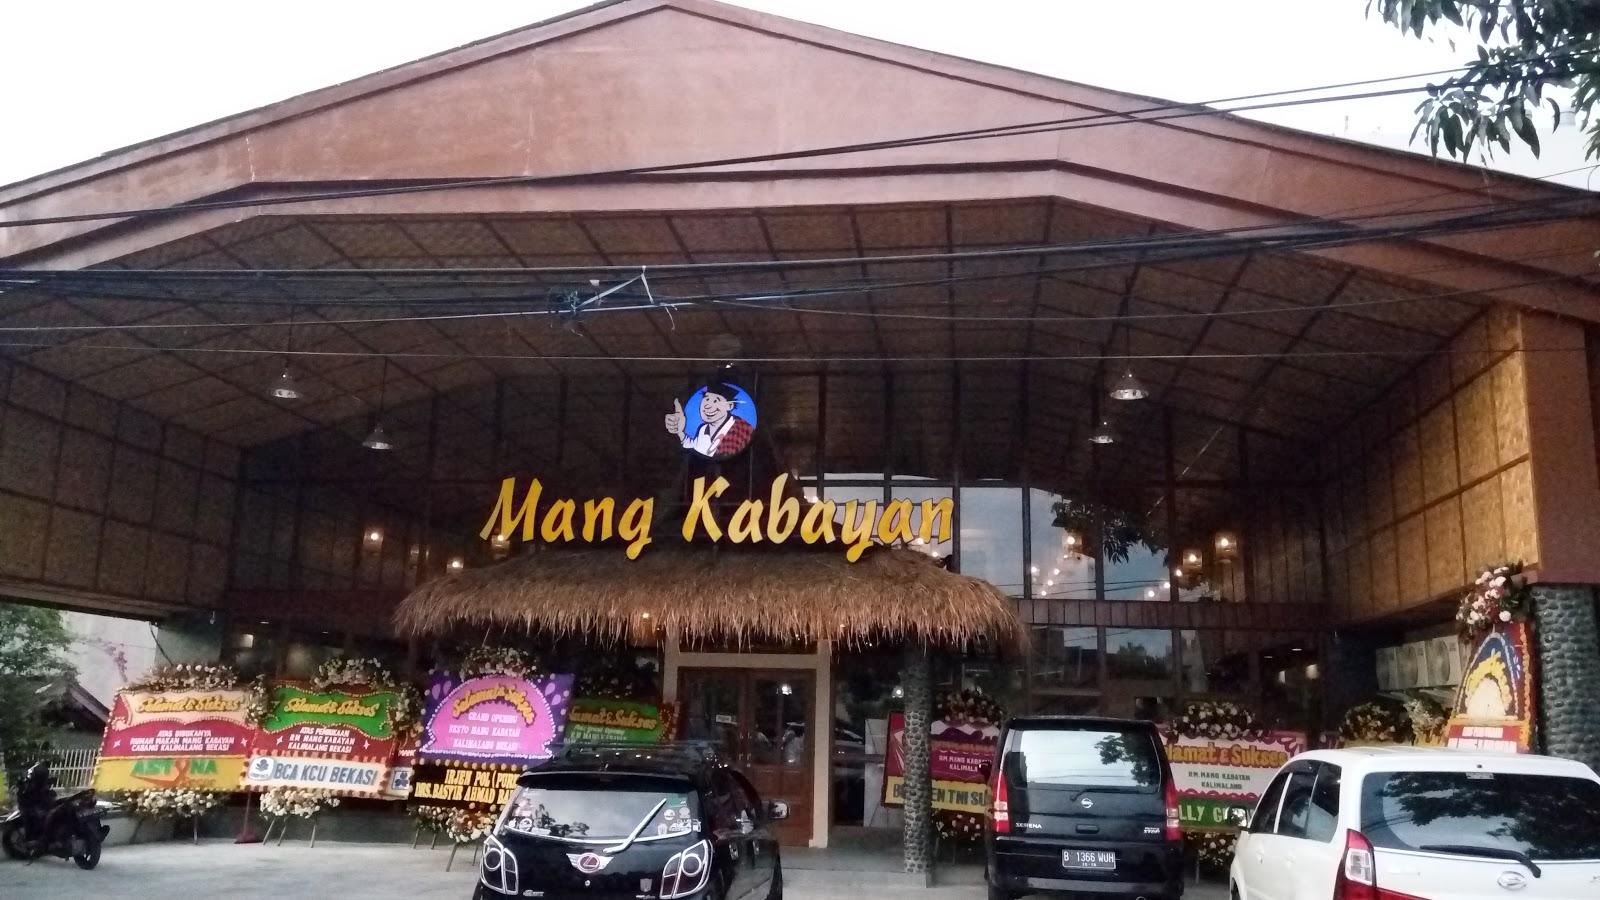 http://mangkabayan68.blogspot.co.id/2016/06/cibinong.html